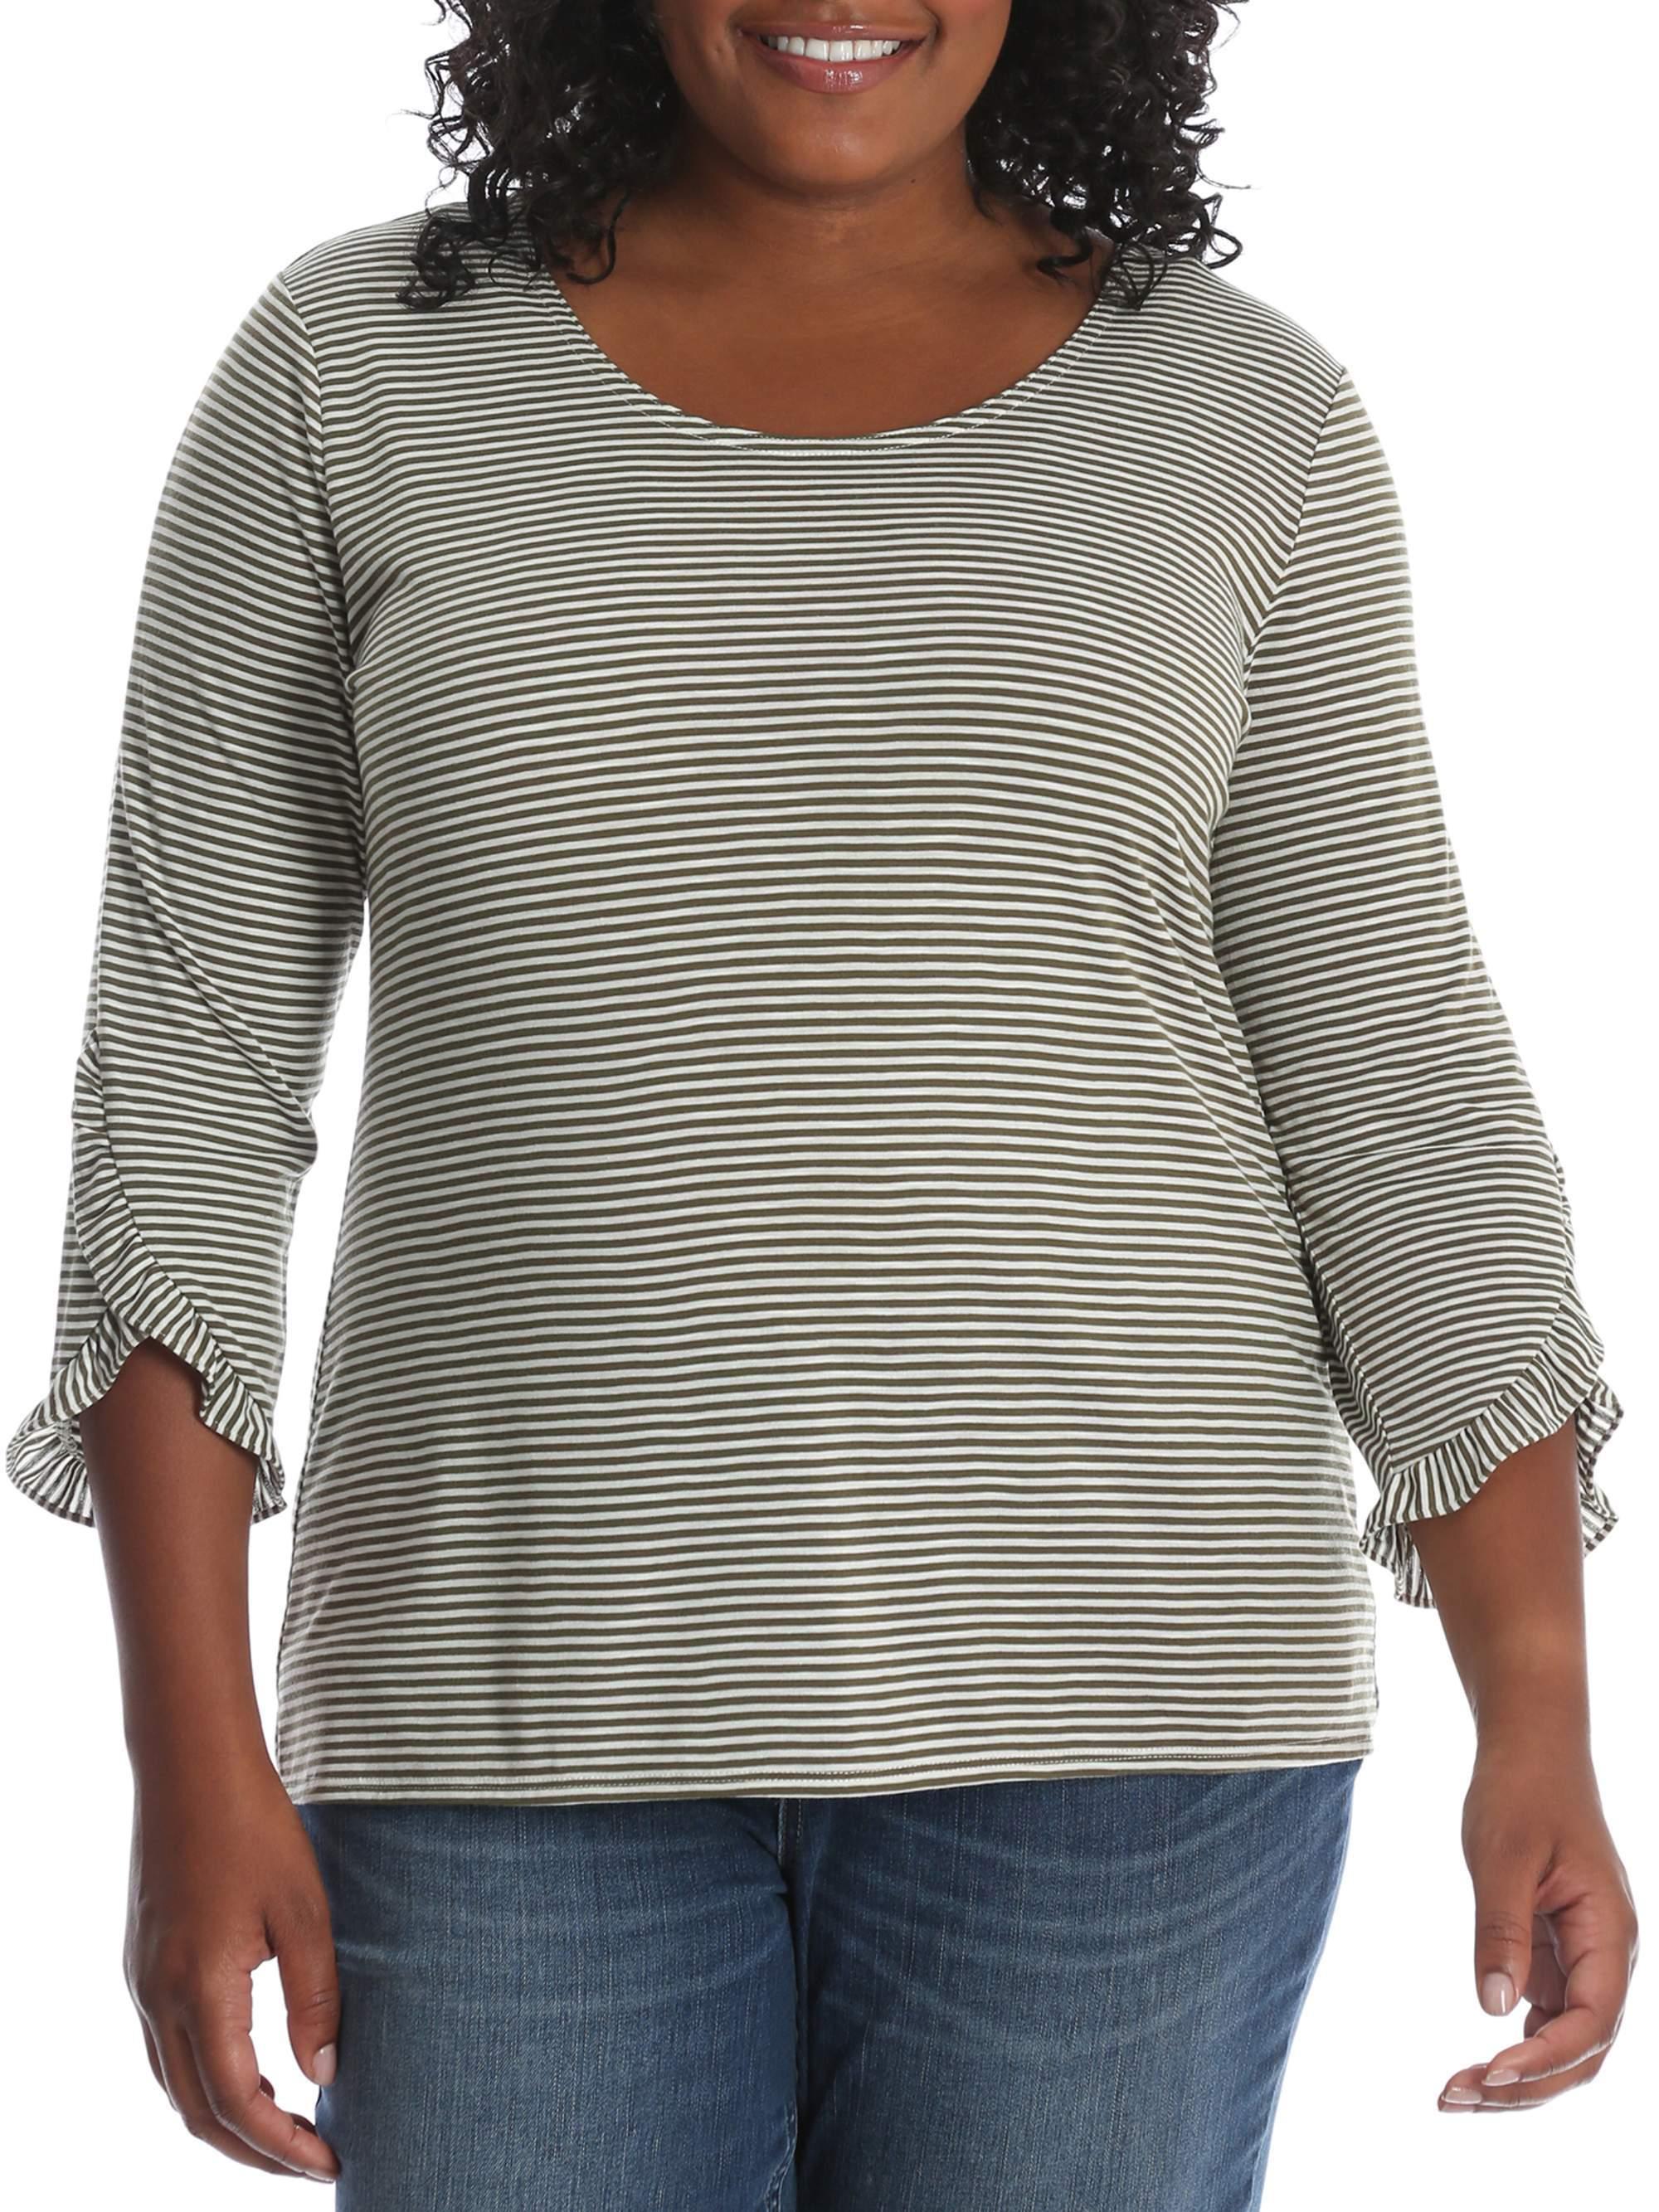 Women's Plus 3/4 Sleeve Heathered Stripe Knit Top